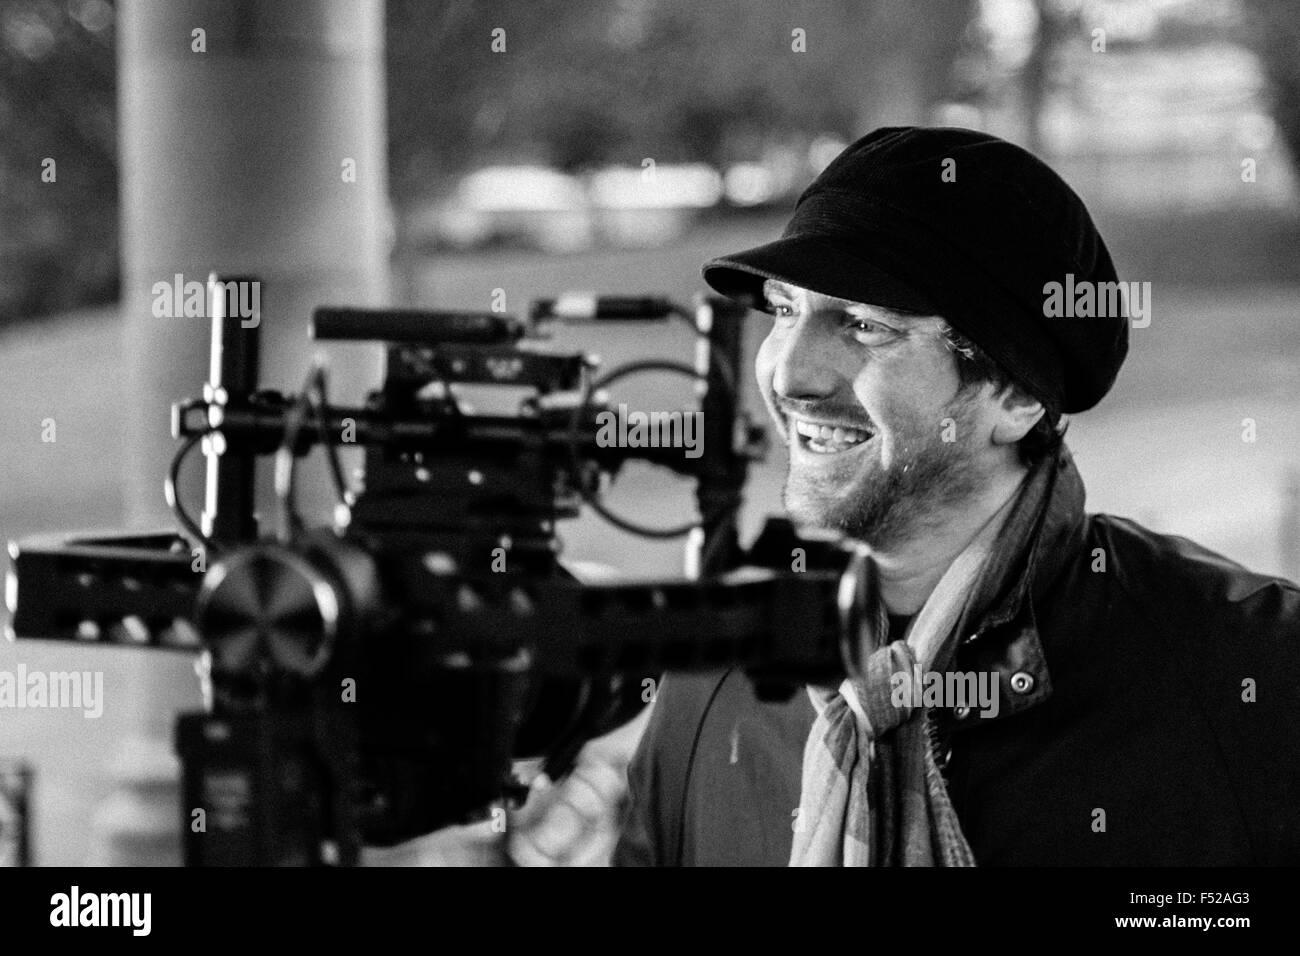 Matthew Milnes, band member of Bradford band Kascarade, shot during filming of music video, Lister Park, Bradford - Stock Image